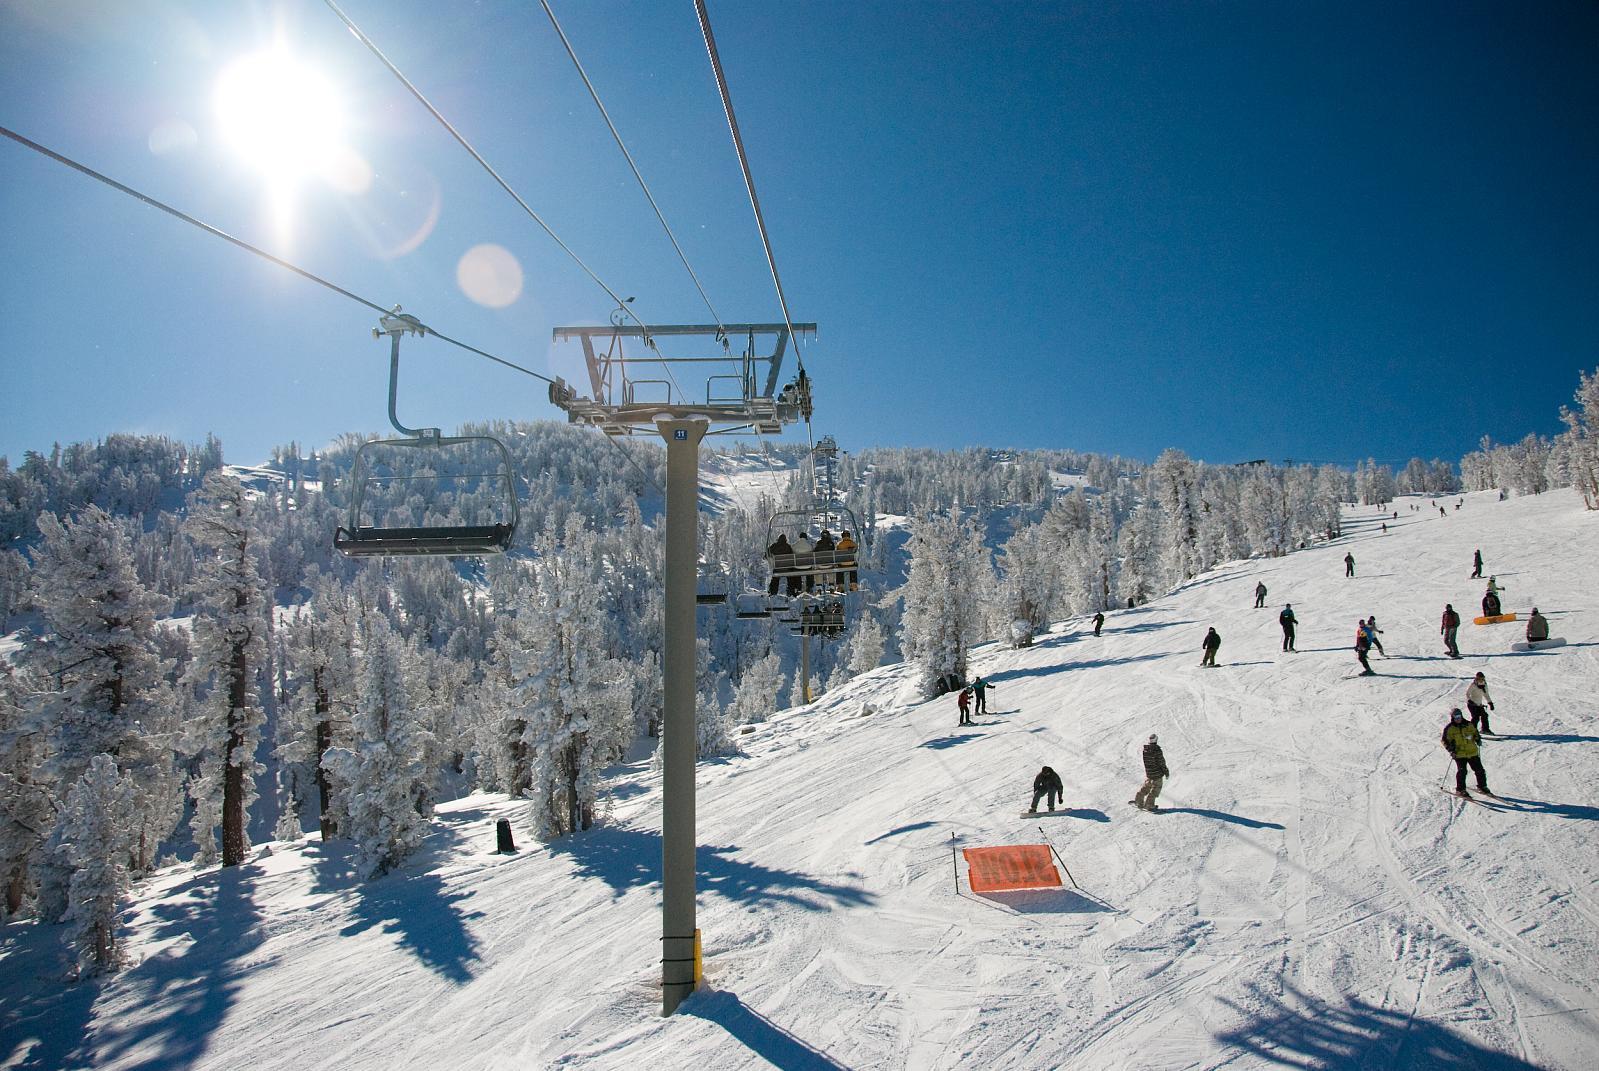 Sunny Day Montbleu Heavenly Ski Resort Lake Tahoe